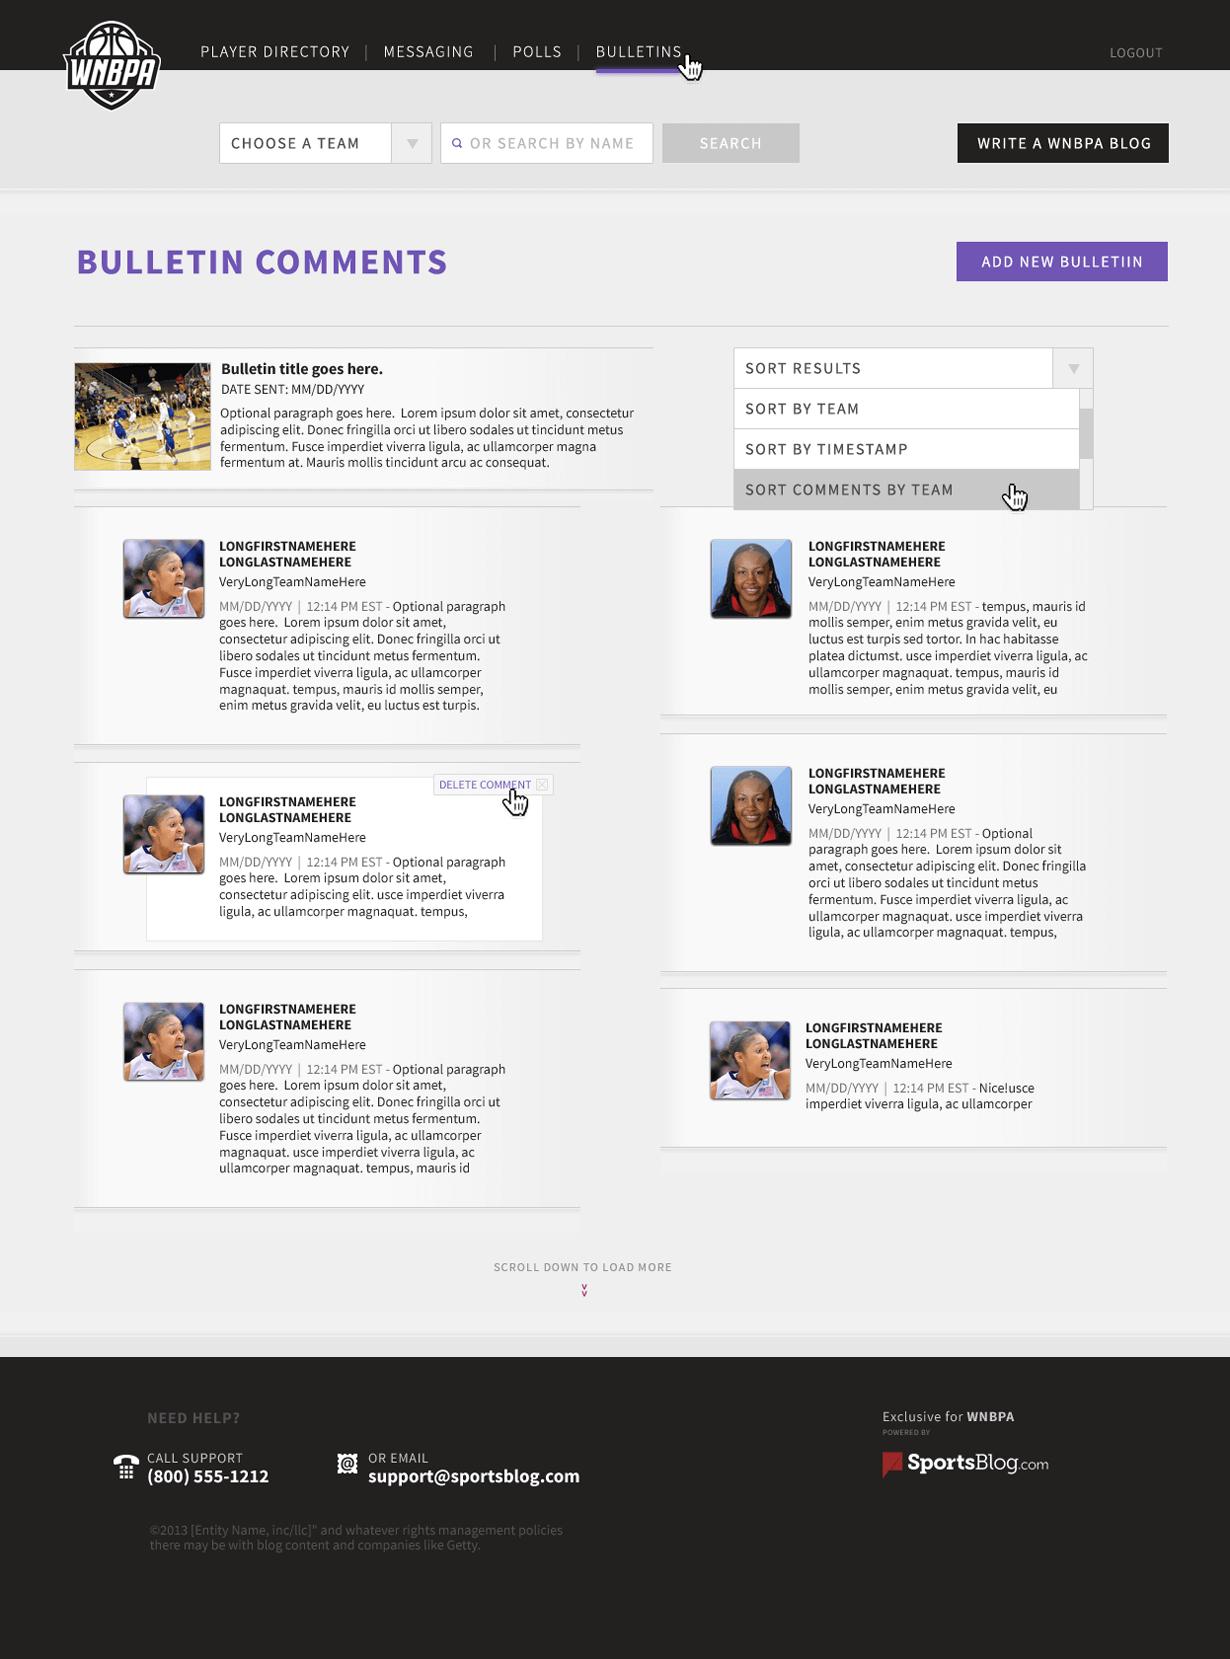 WNBPA Bulletin Comments